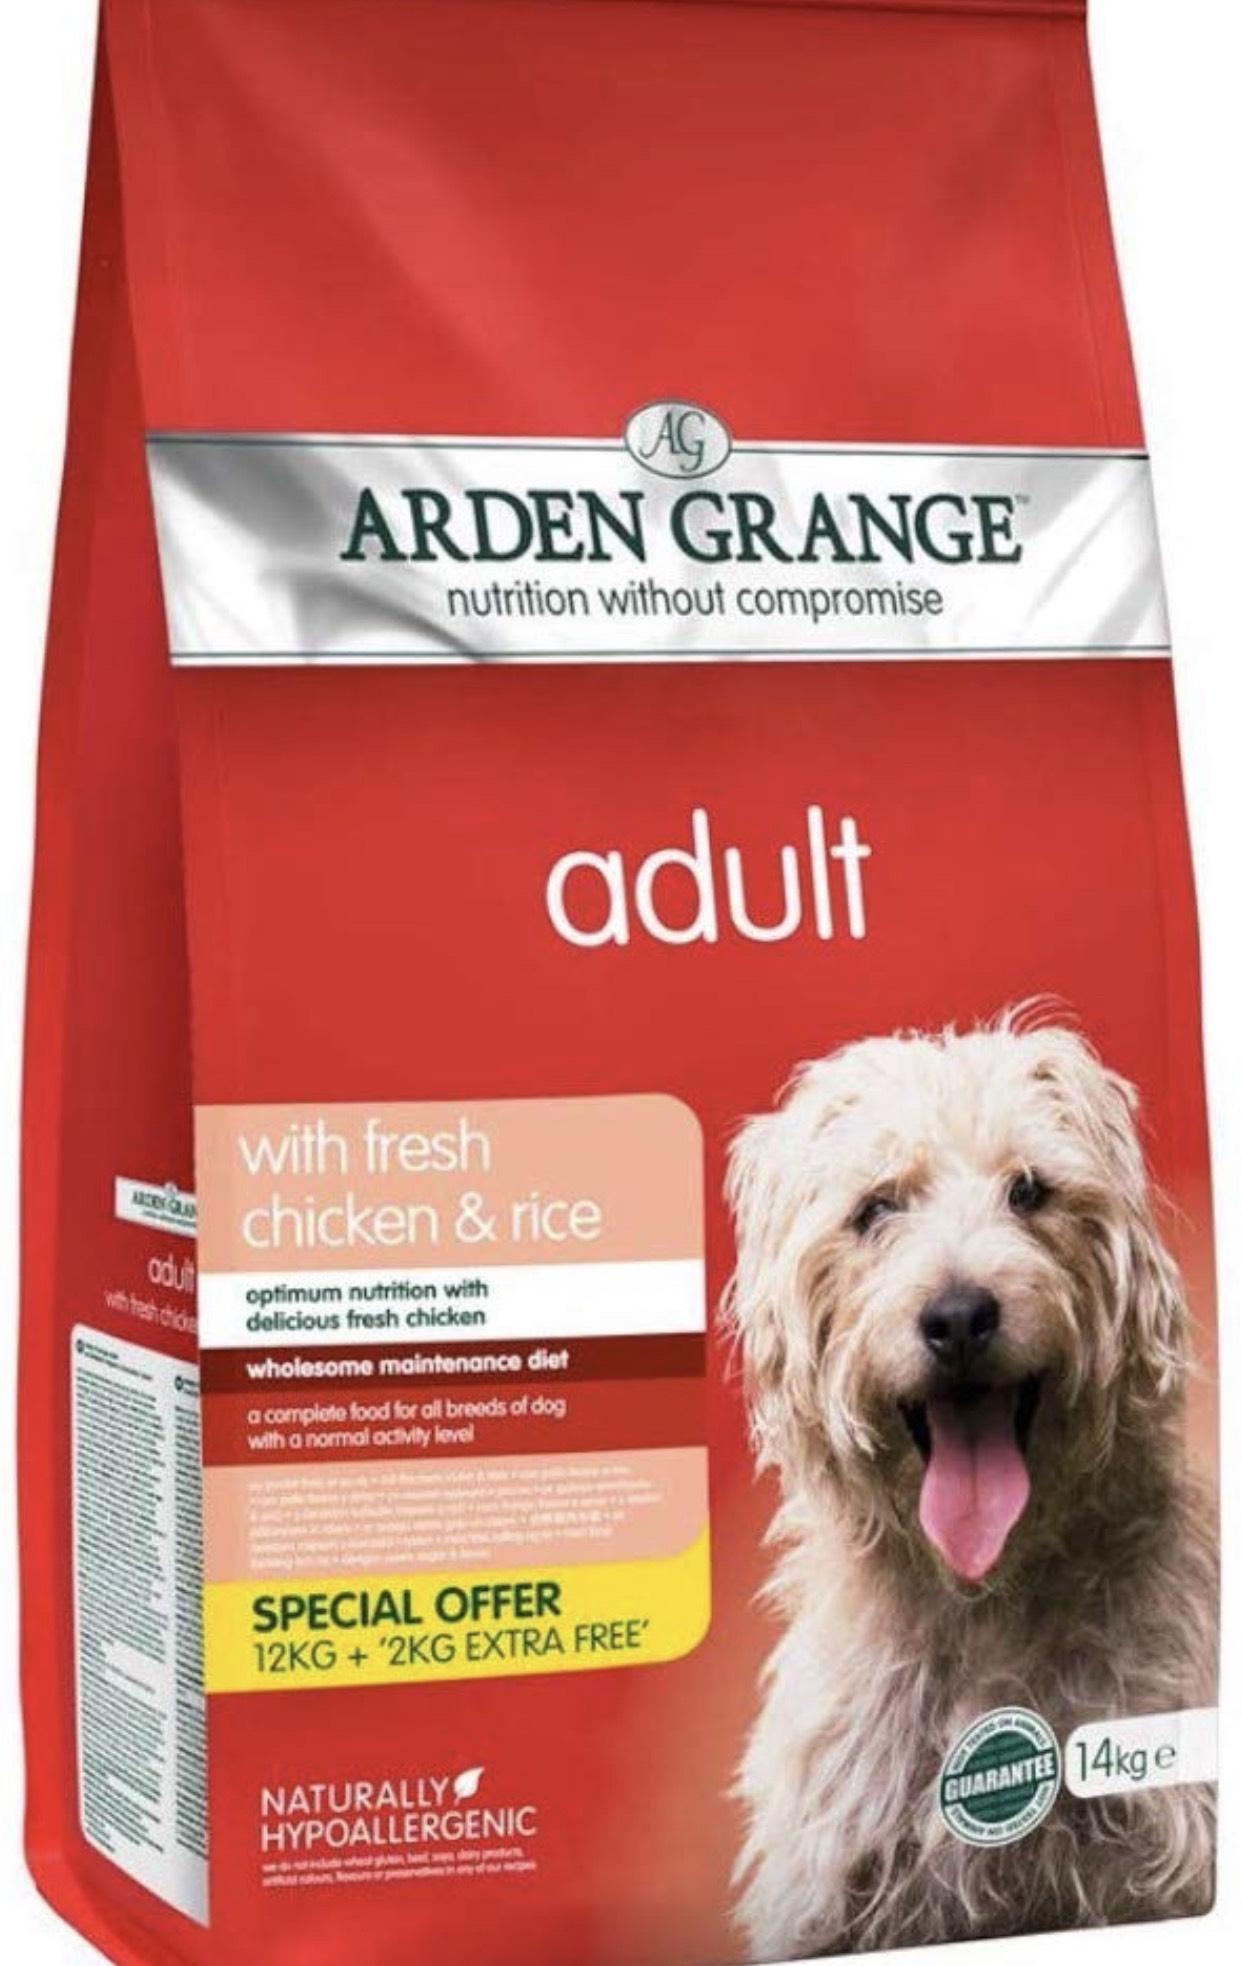 Arden Grange Dry Dog Food 12kg + 2kg free £23.48 at Amazon